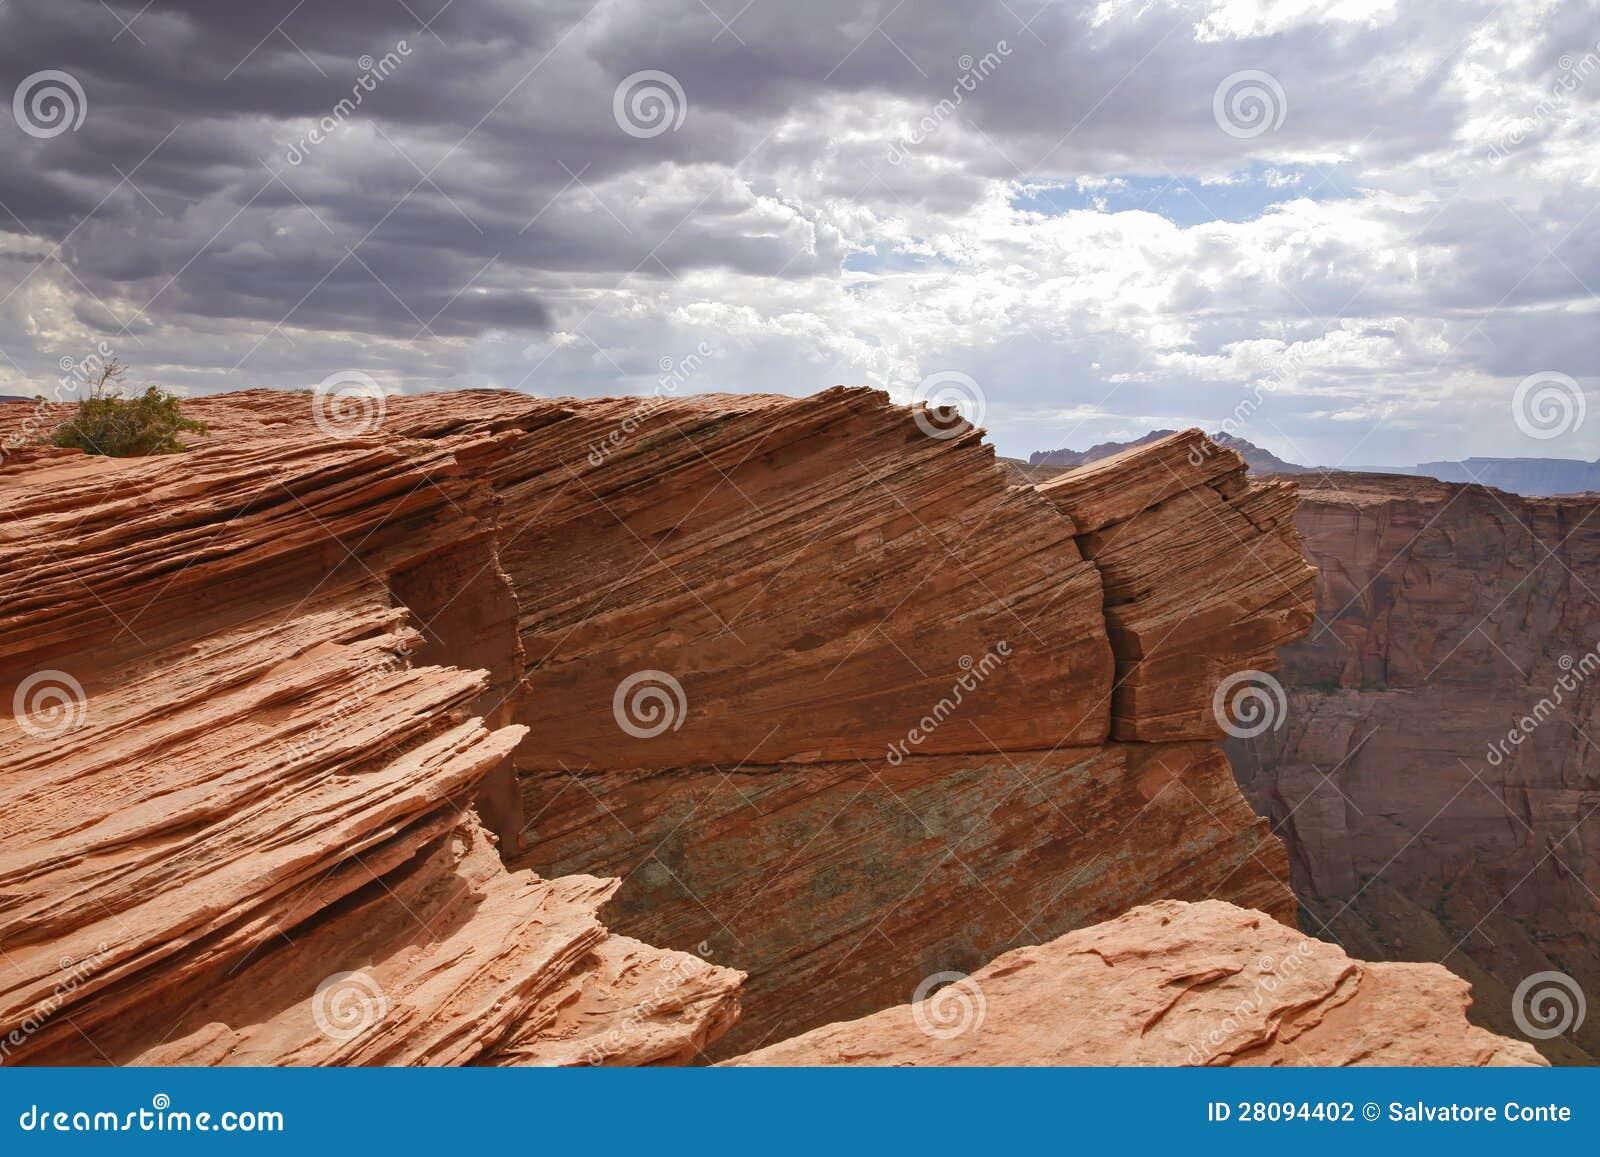 Rode woestijn en bewolkte hemel, Pagina - Arizona